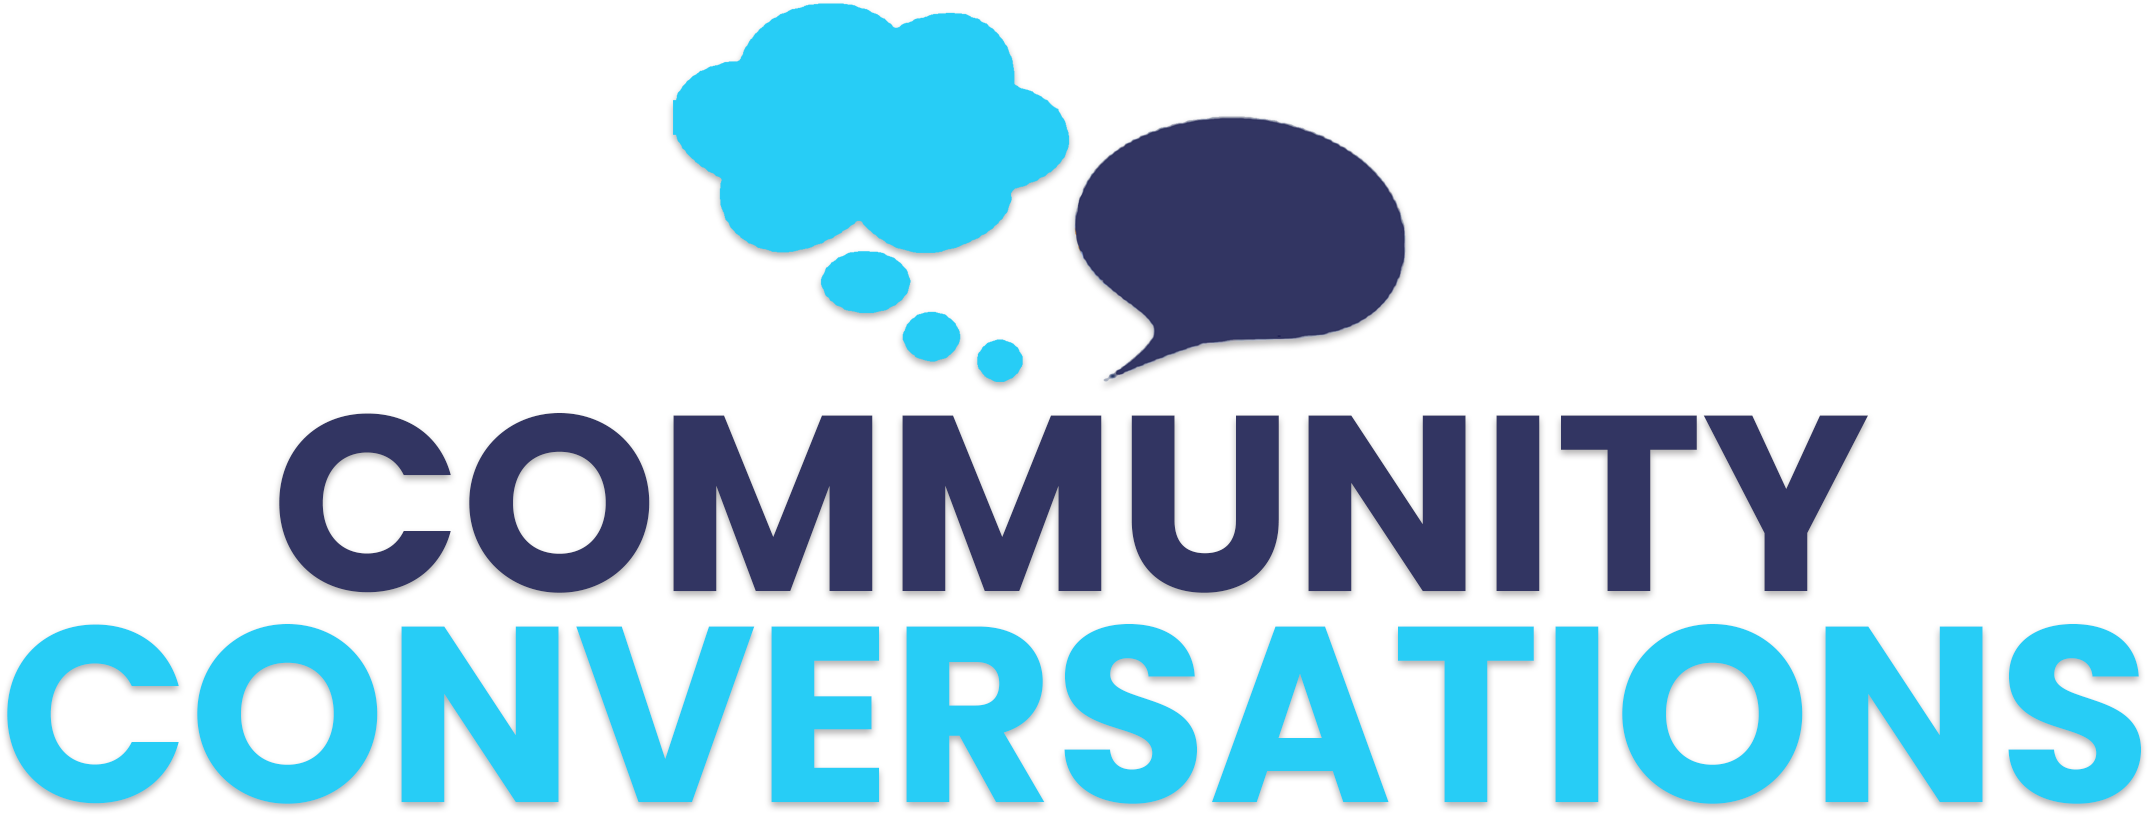 Final Community Conversation Event for 2020!